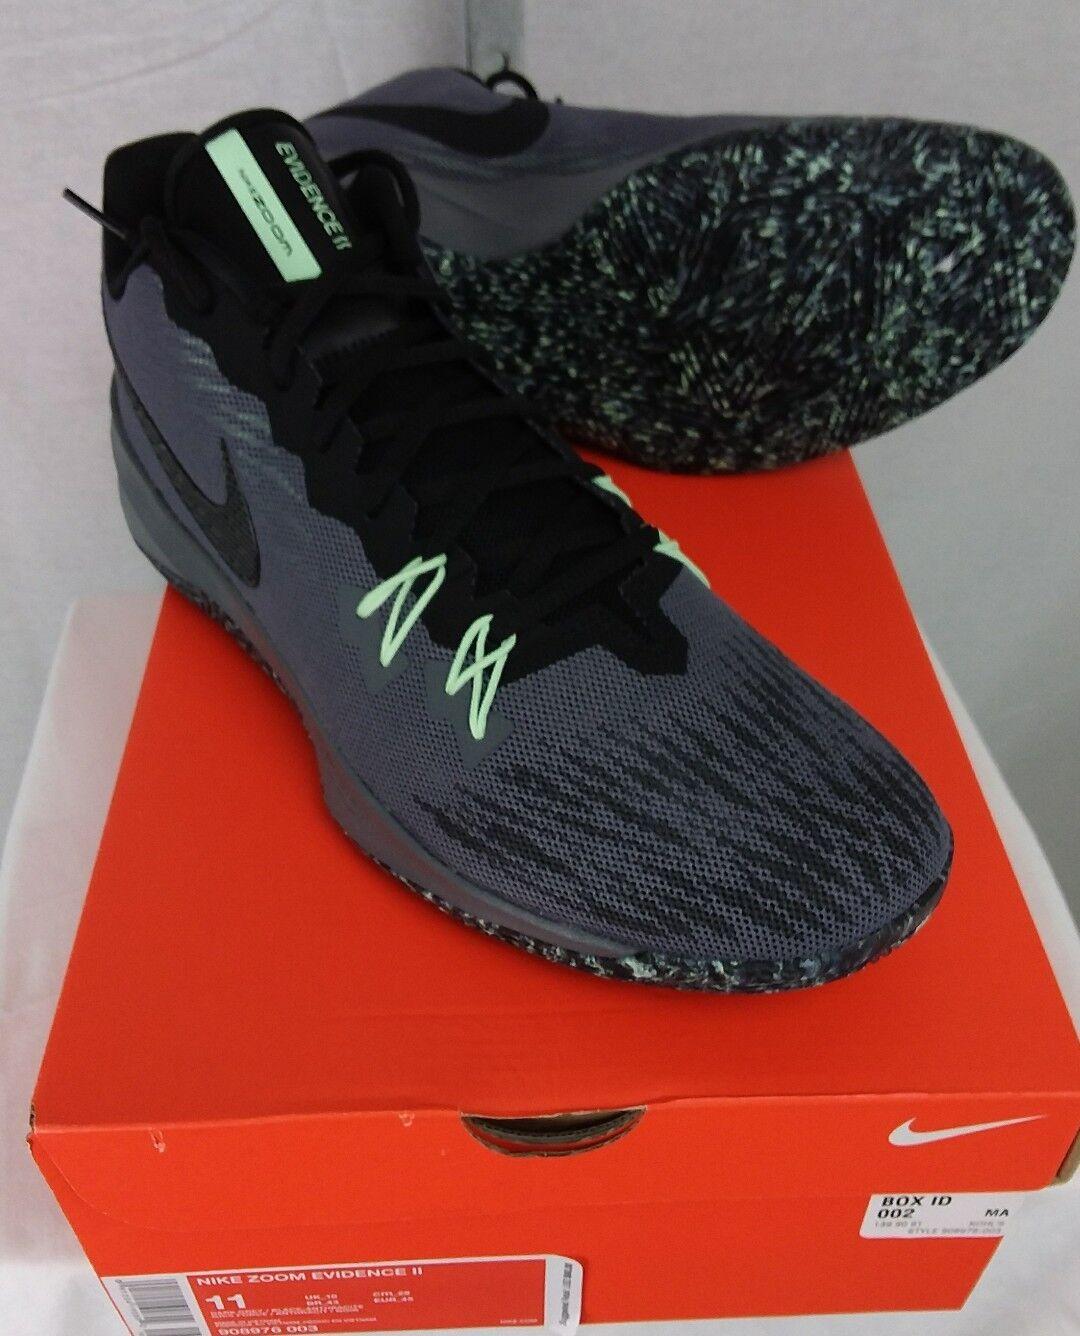 Nike Zoom Evidence II Men Sz 11 Basketball Shoes Sneakers Trainers Gray Black